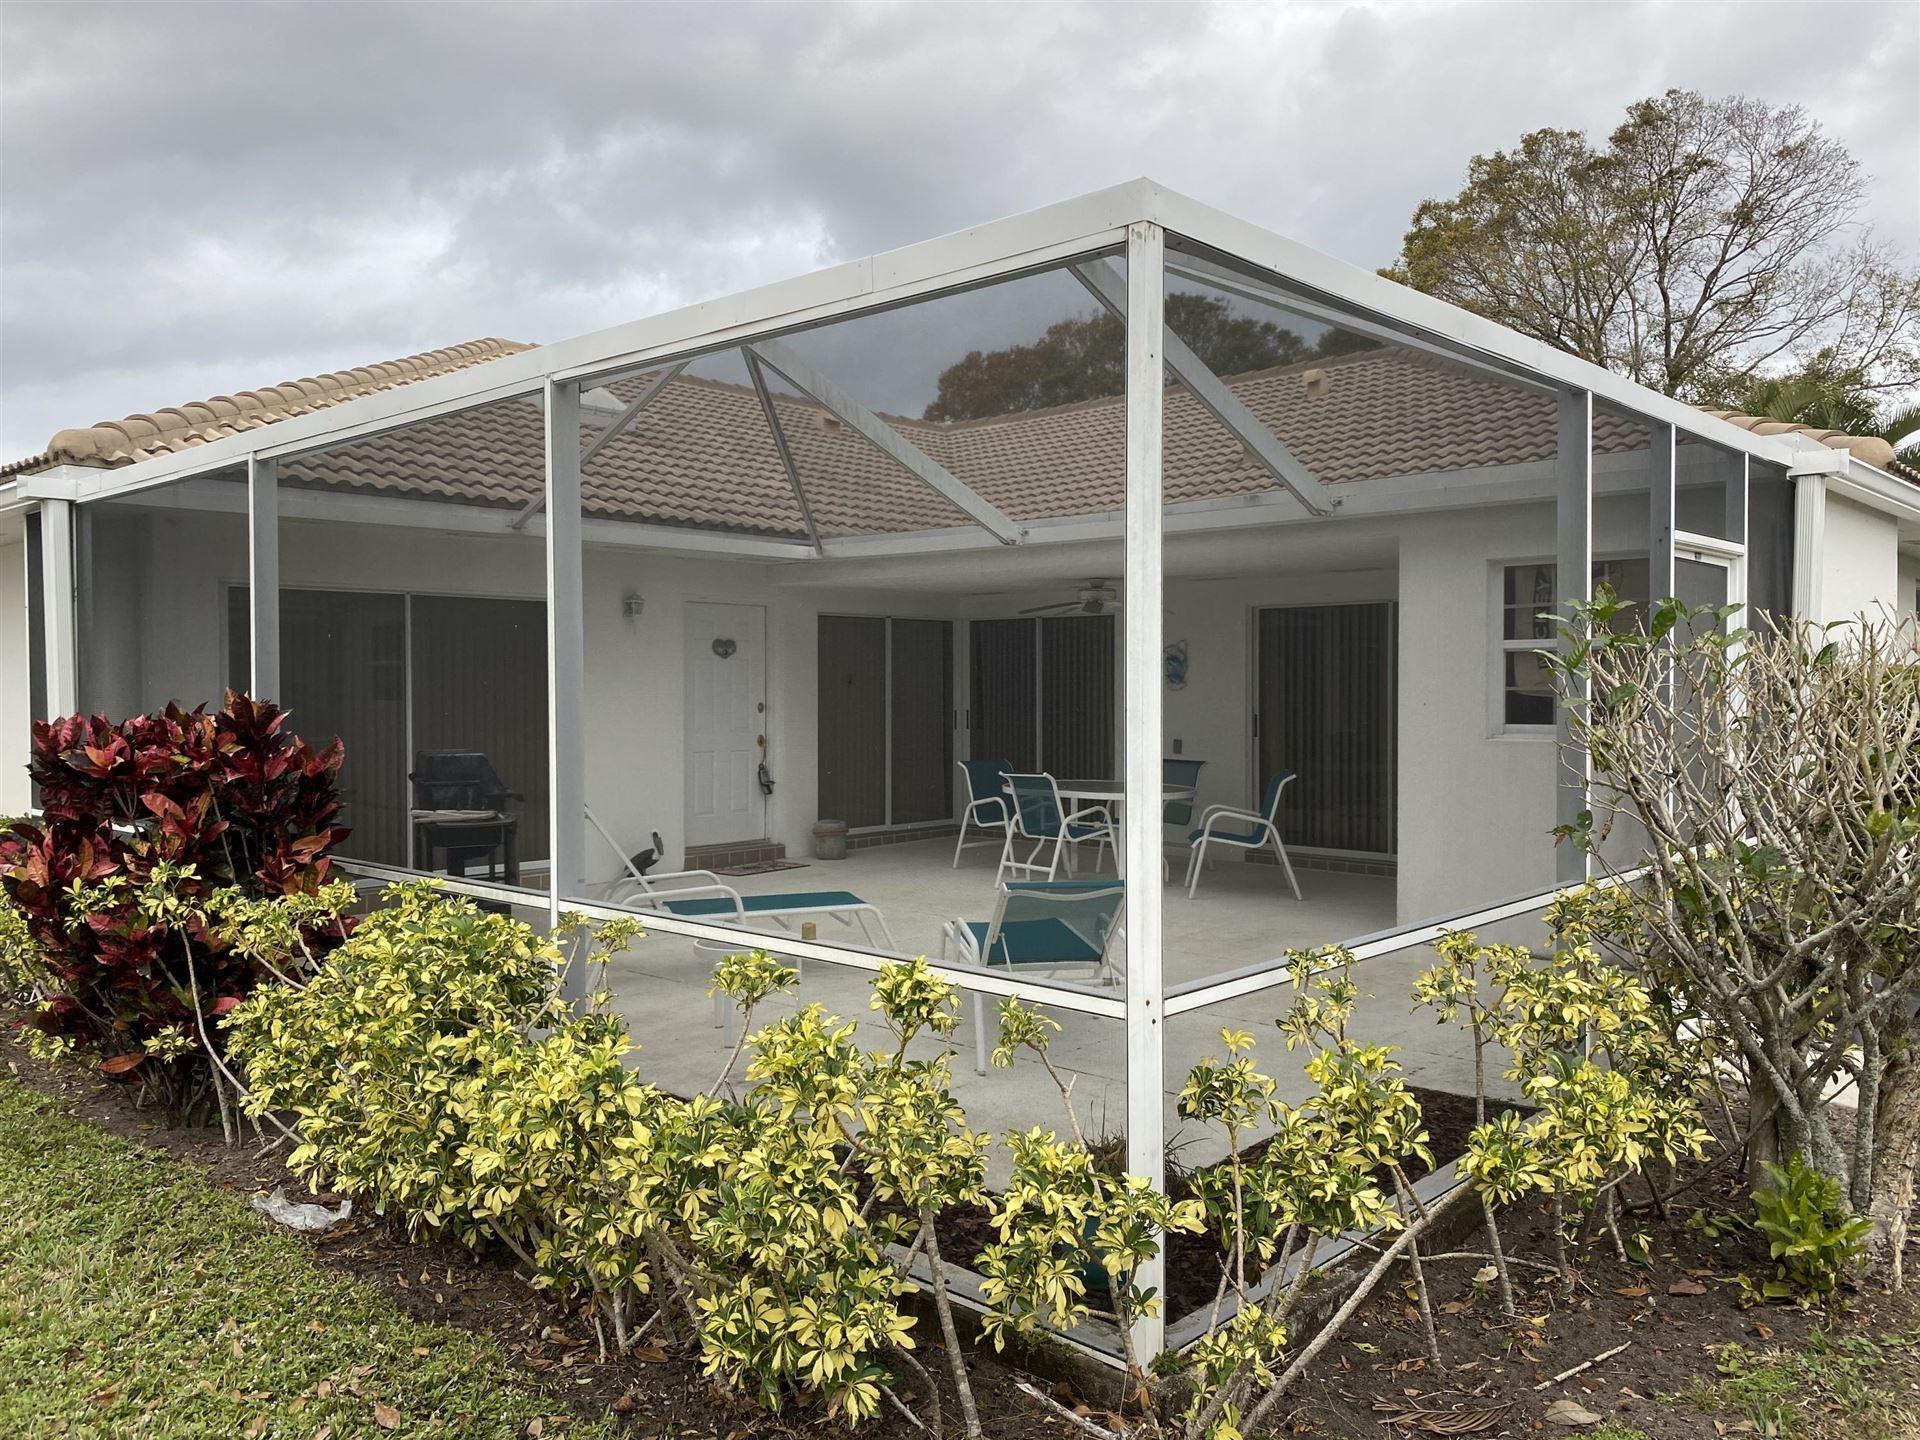 Photo of 1803 Silverleaf Oak Court, Palm Beach Gardens, FL 33410 (MLS # RX-10685651)